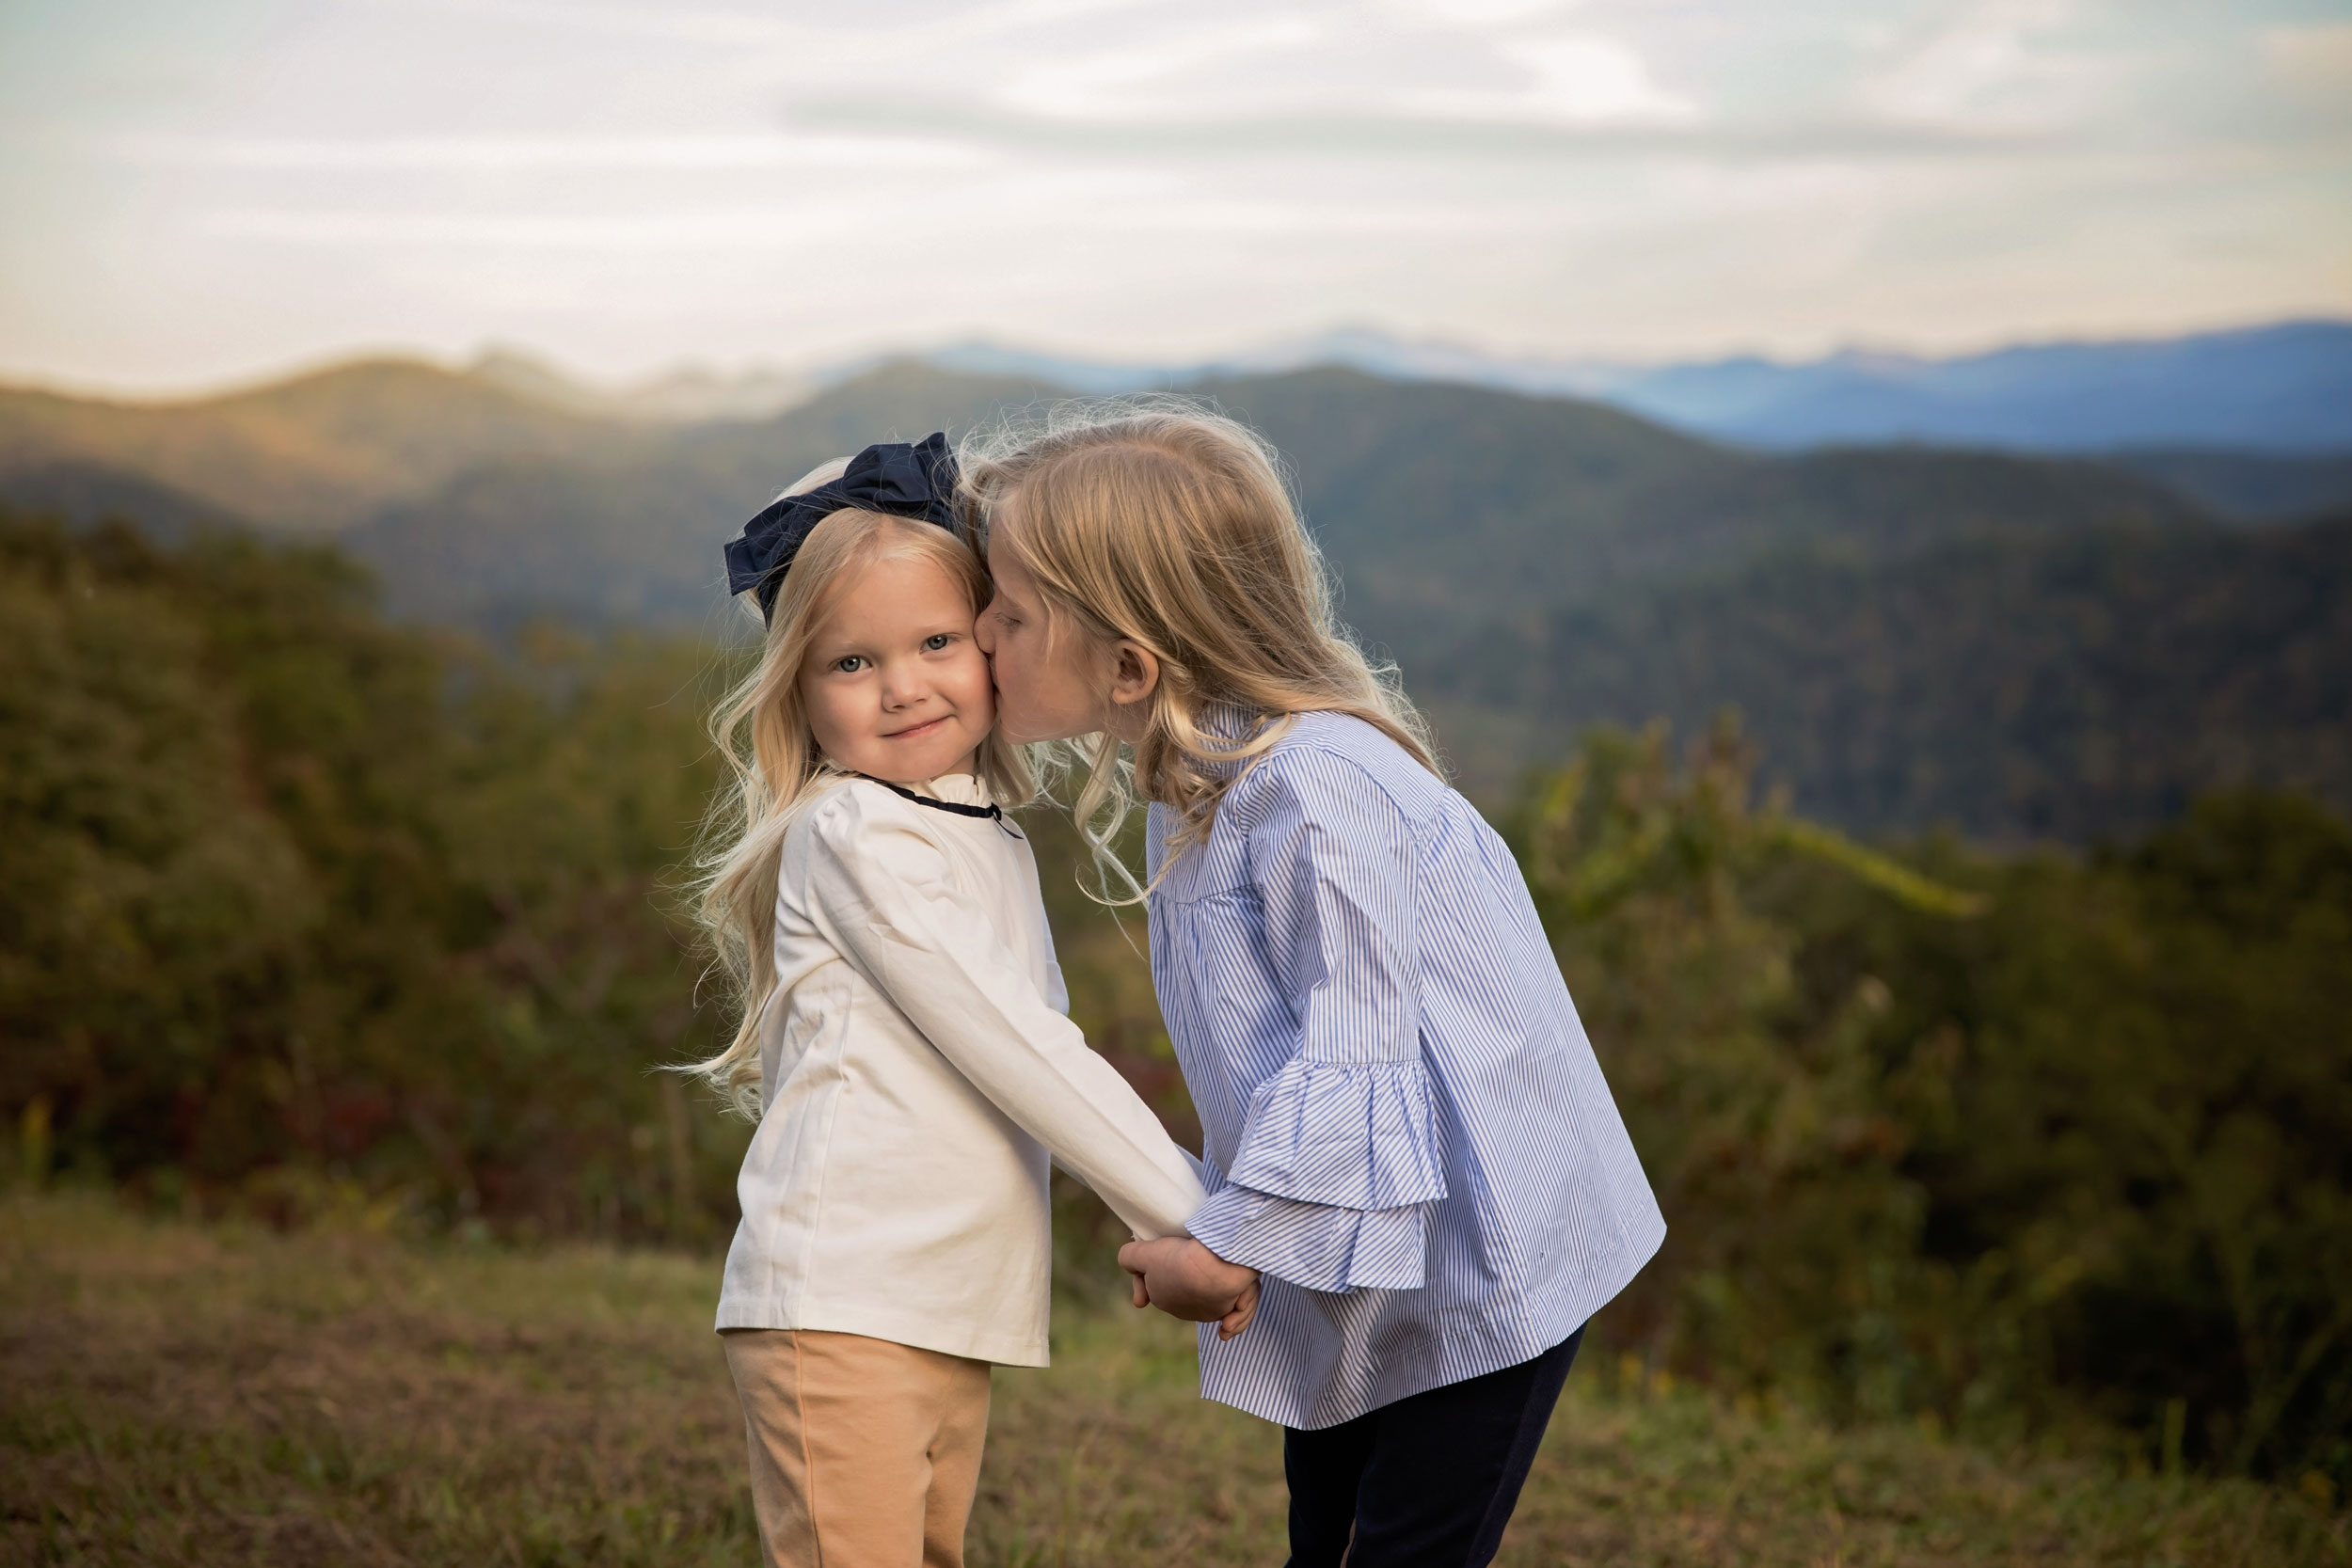 gatlinburg-family-vacation-photography-sisters.jpg